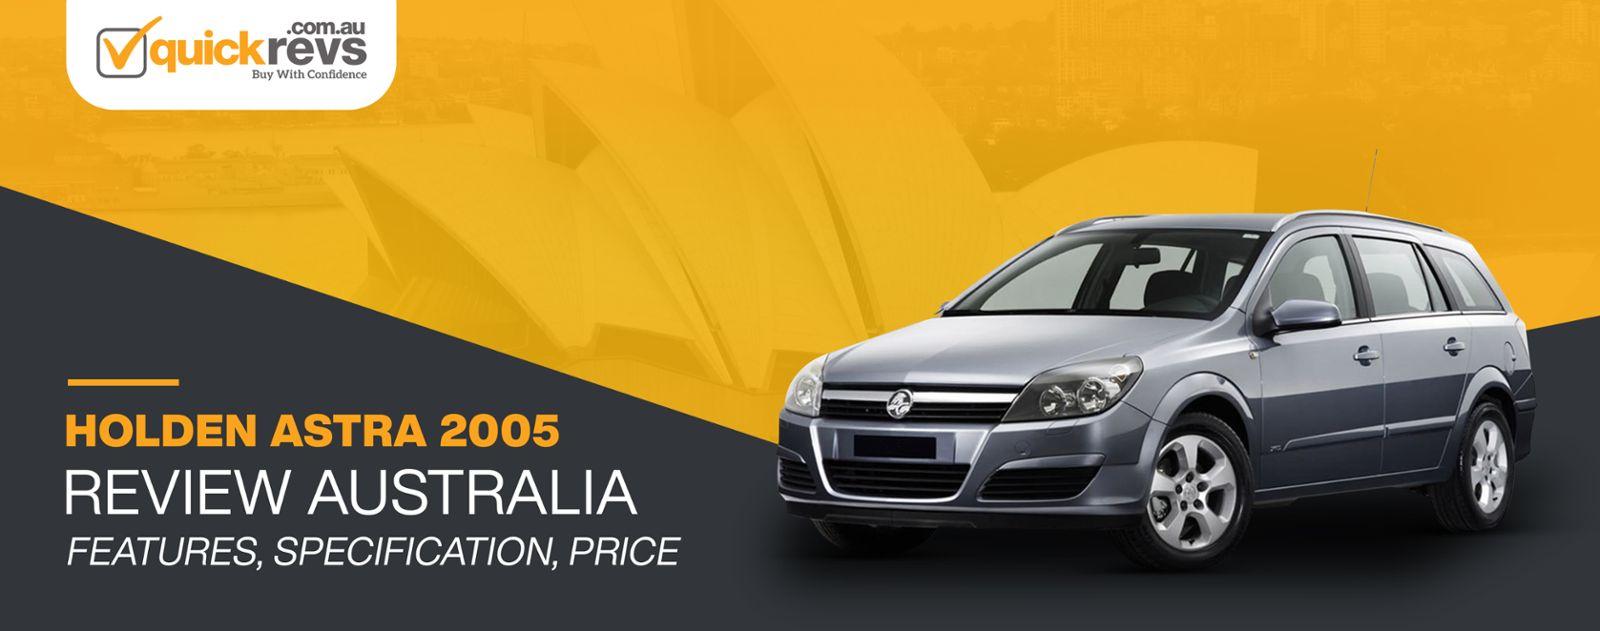 Holden Astra 2005 Review Australia